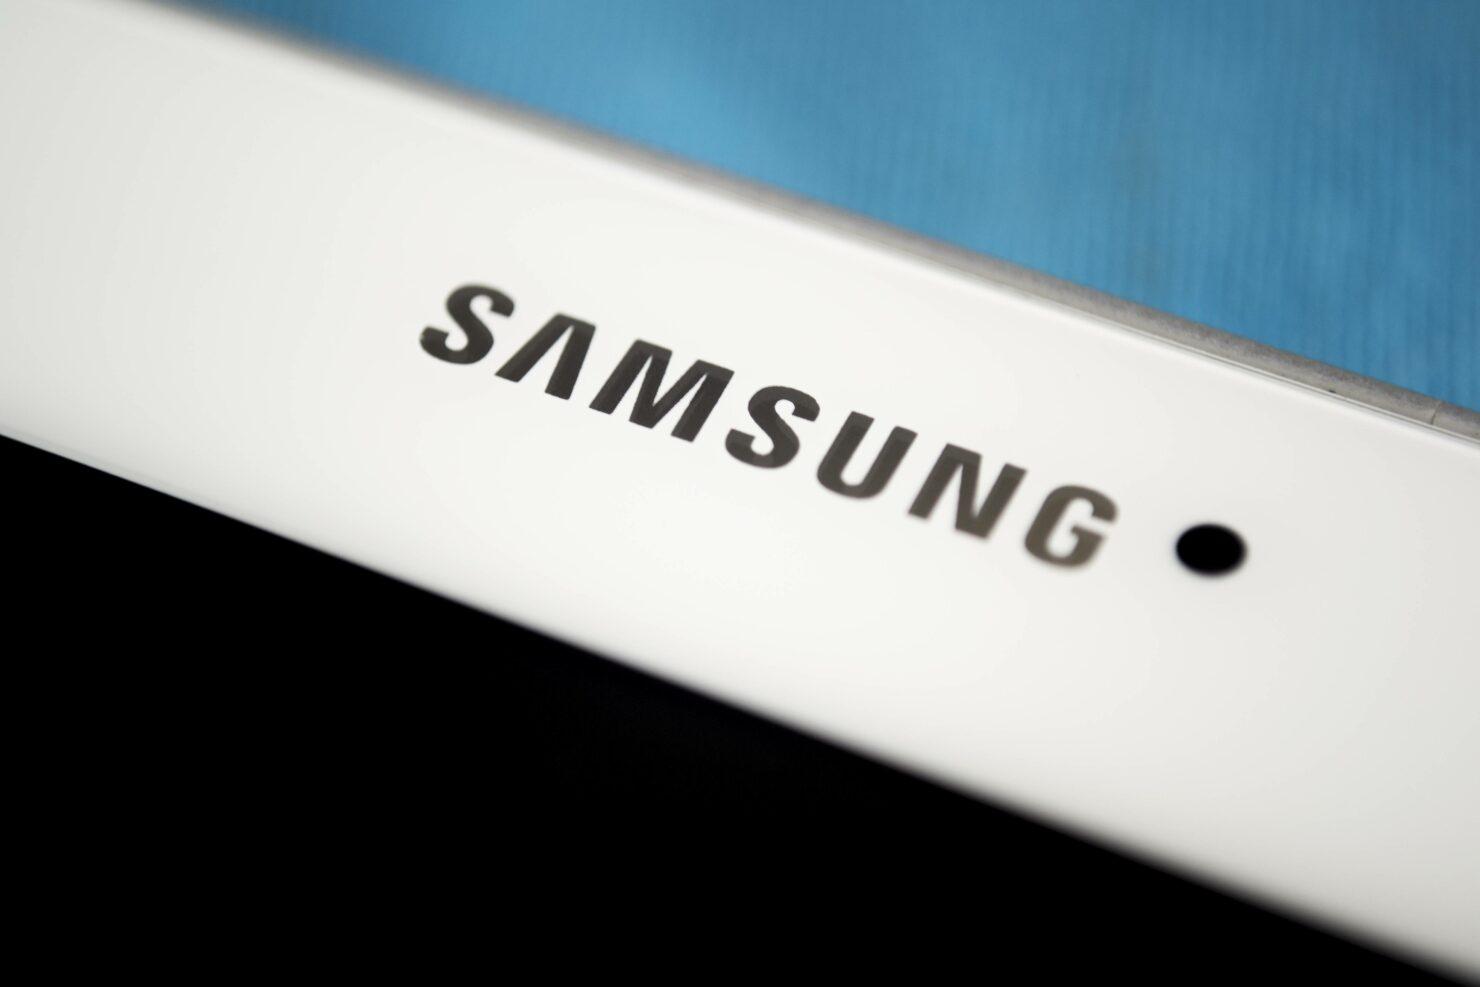 Samsung no Note 7 talk CES 2017